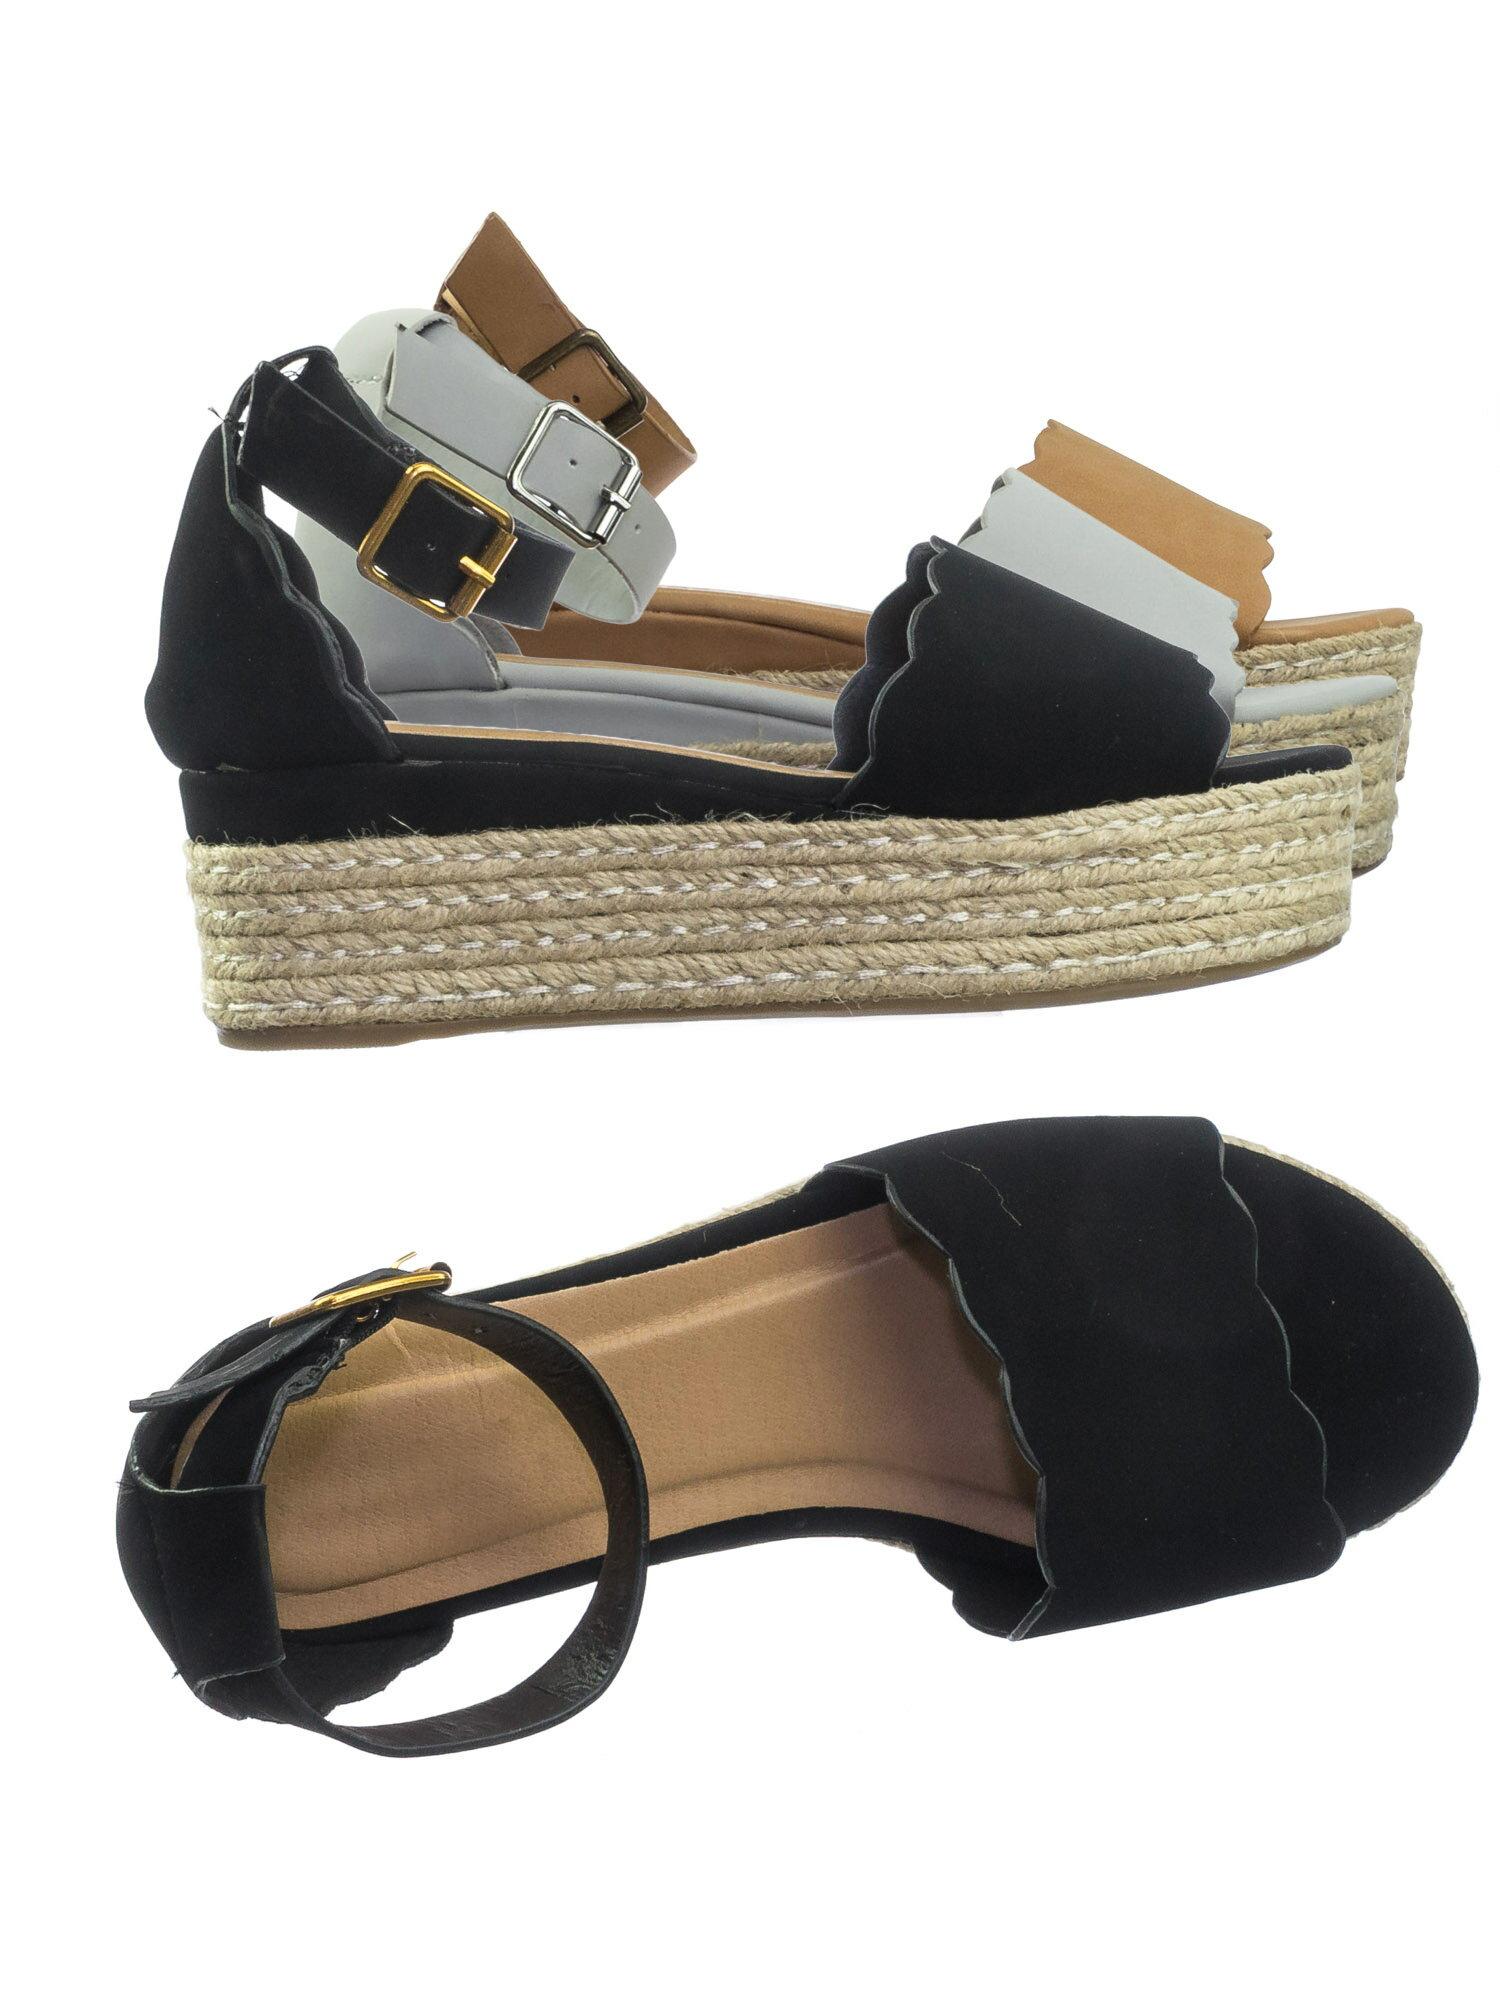 3b1b8f10337 Infinity06 Black Nubuck by Bamboo Scallop Espadrille Jute Rope Wrap Platform  Flatform Flat Sandal 0